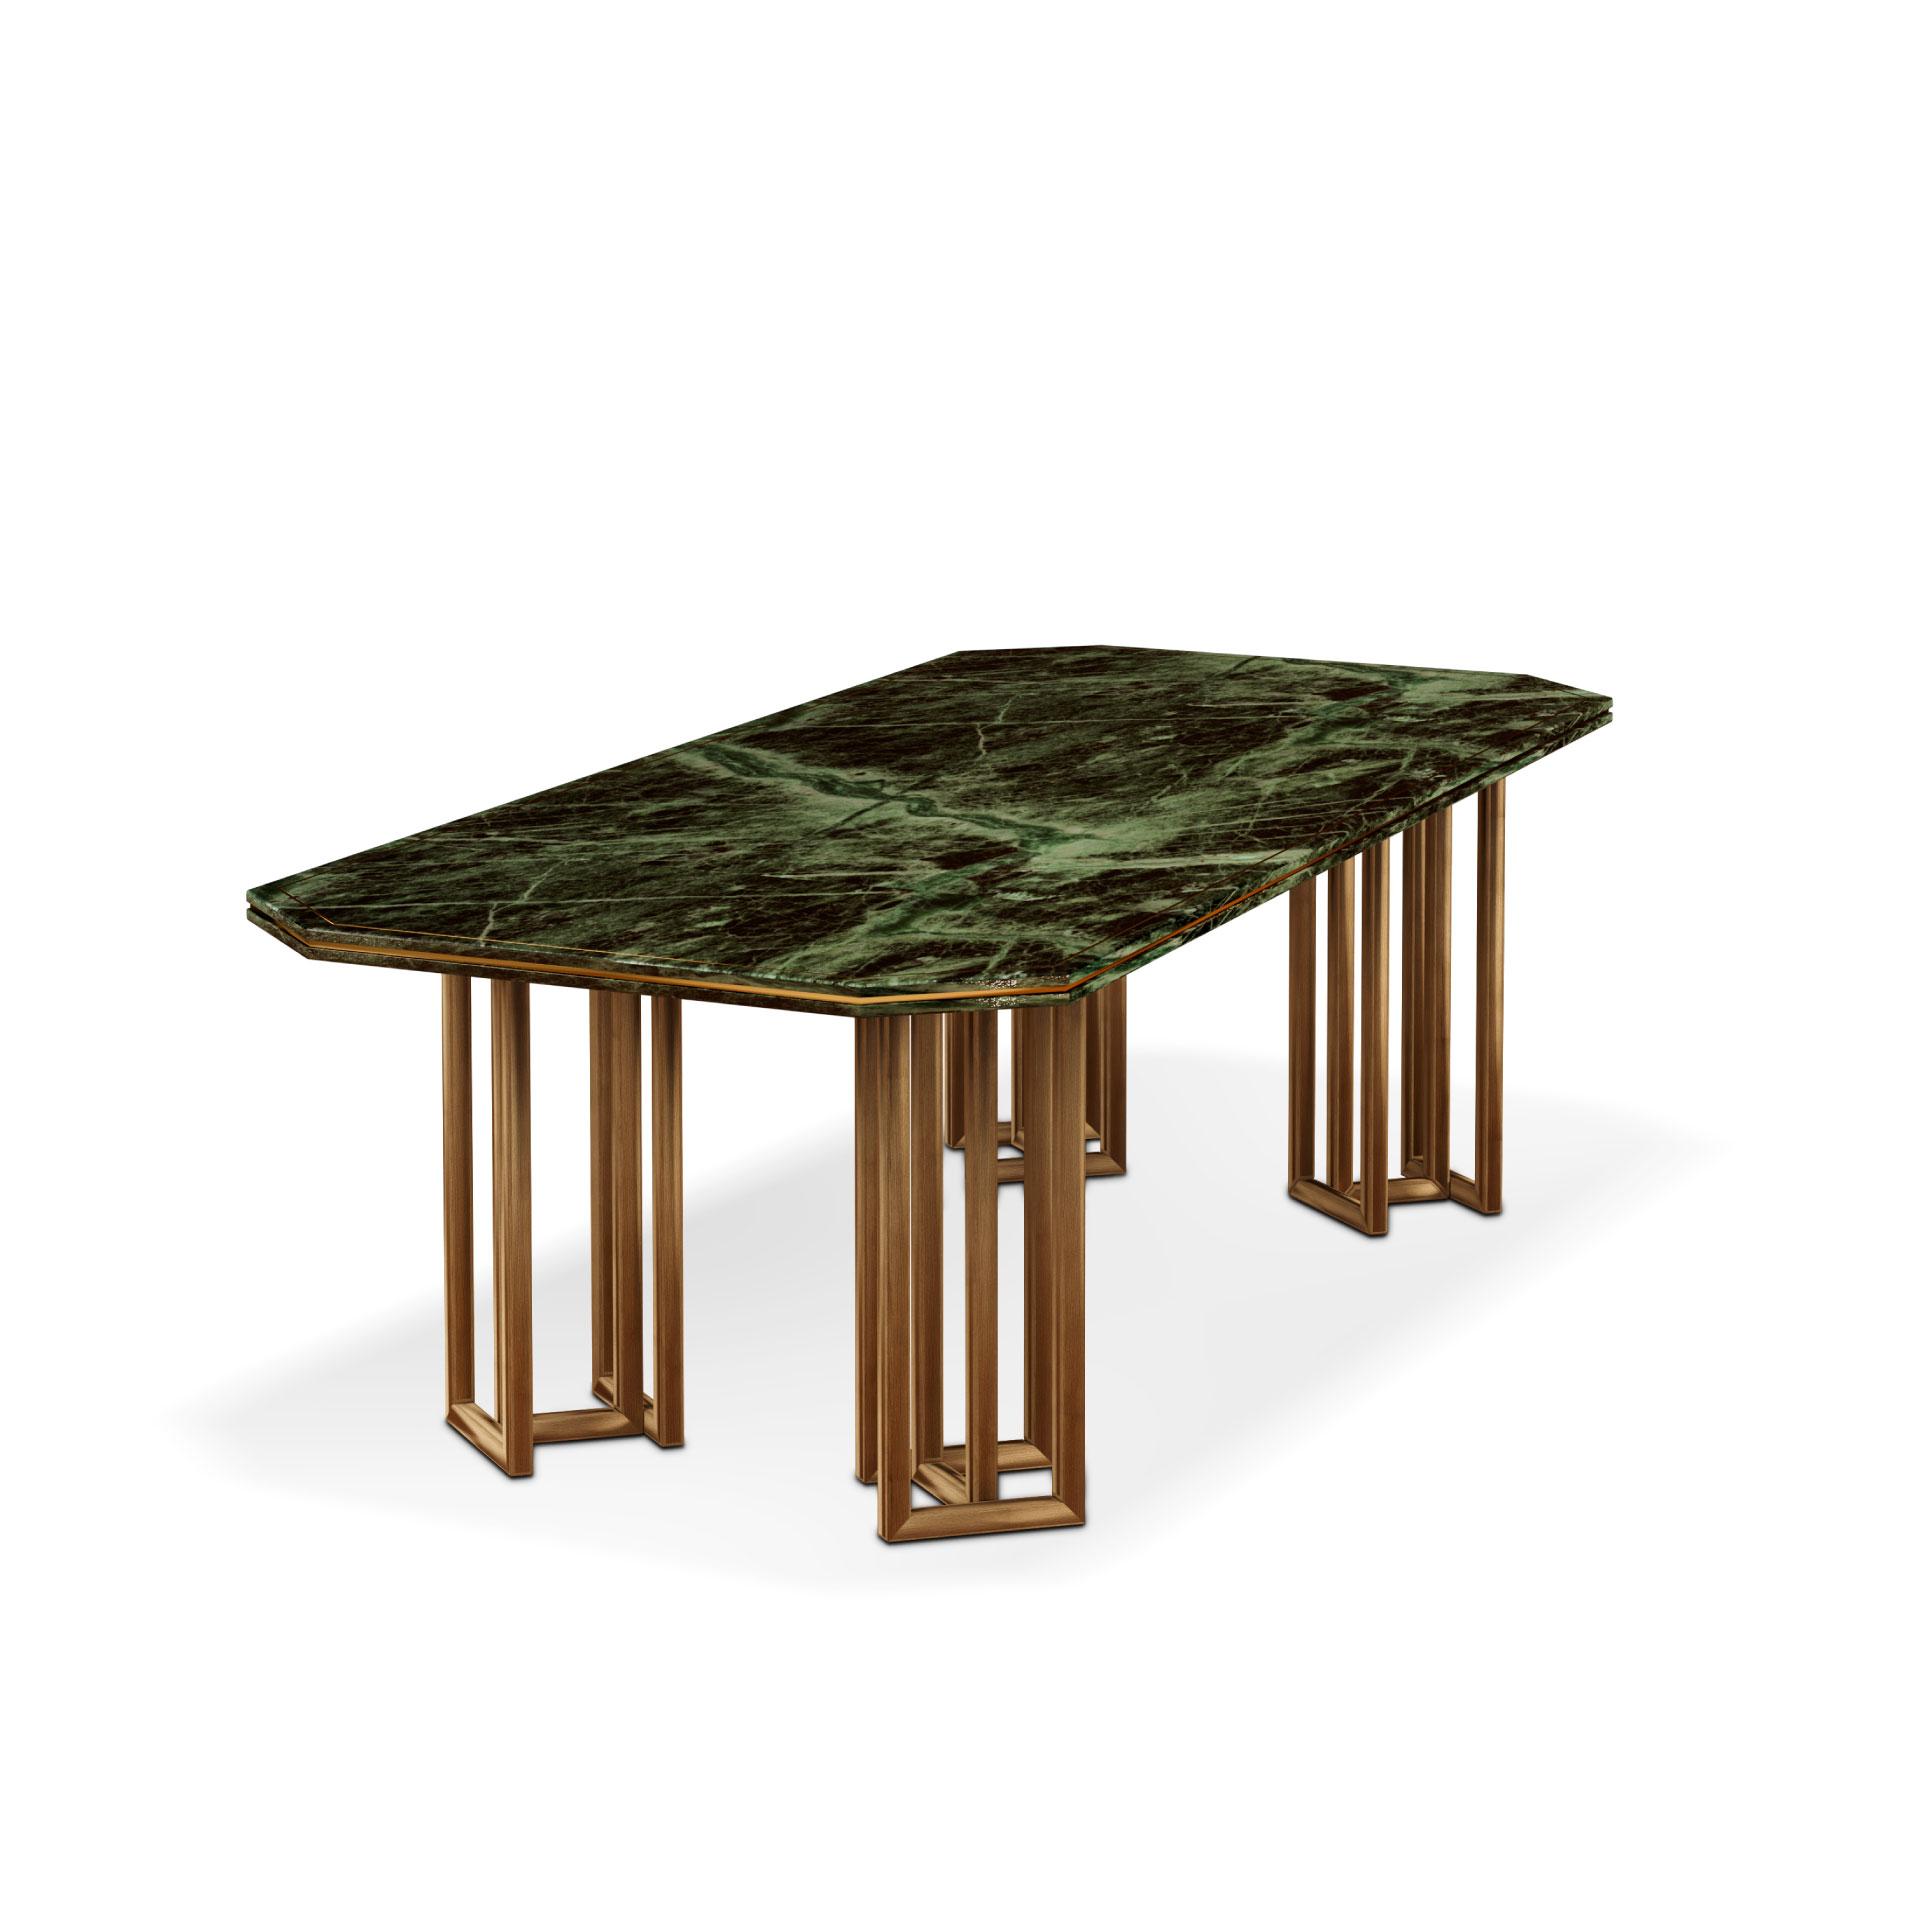 Hancock dining table